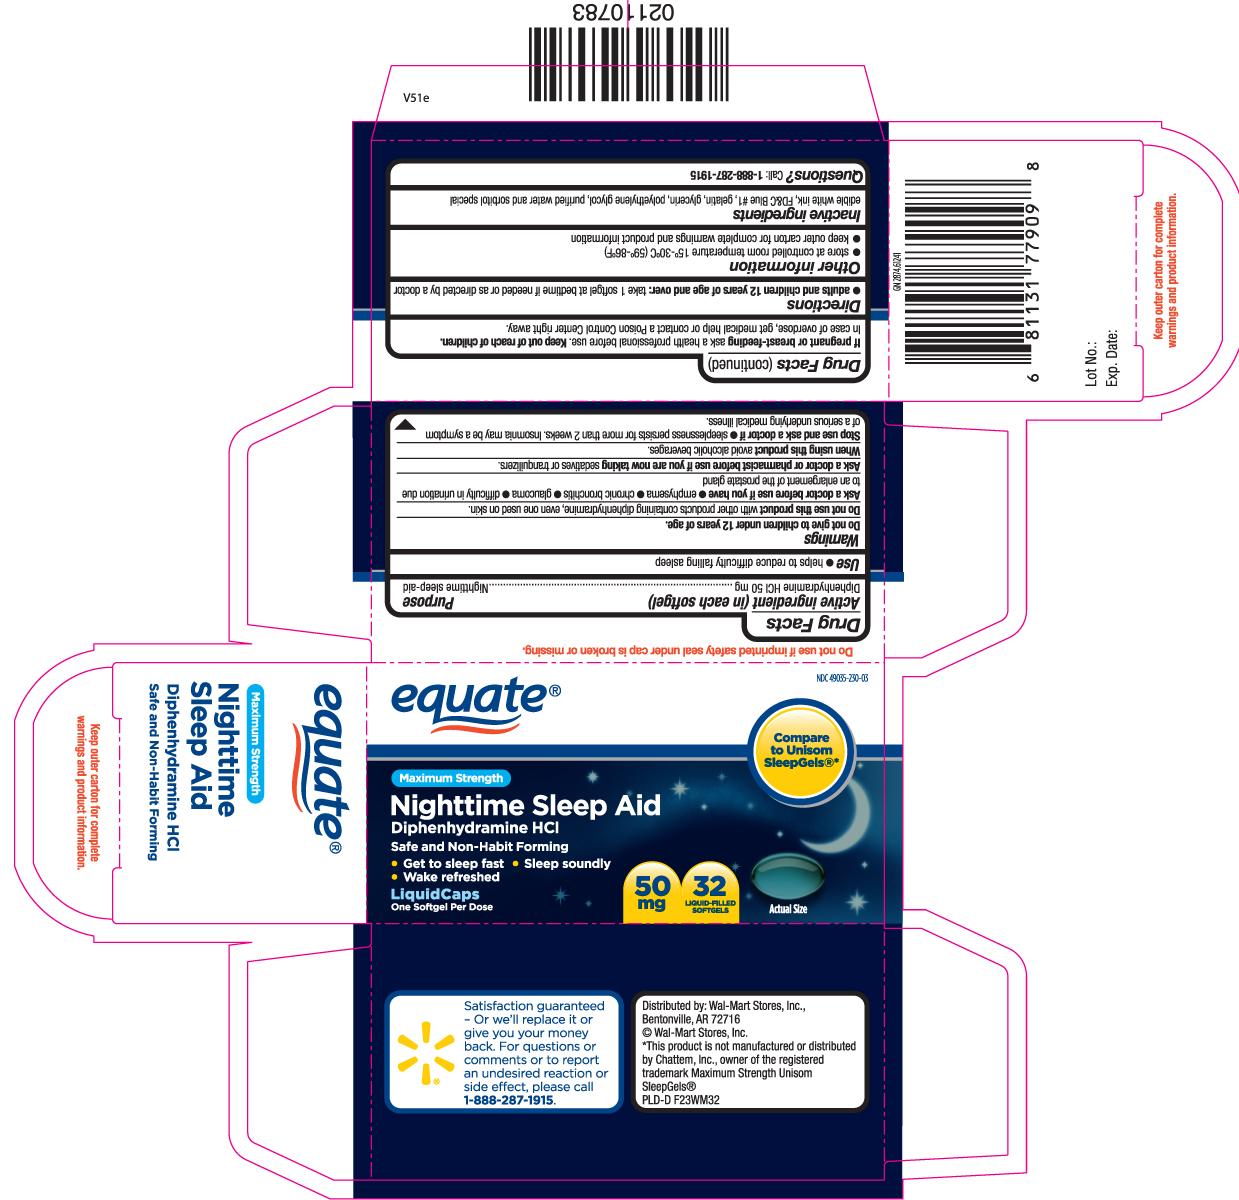 Nighttime Sleep Aid Maximum Strength (Diphenhydramine Hcl) Capsule [Equate (Walmart Stores, Inc.)]